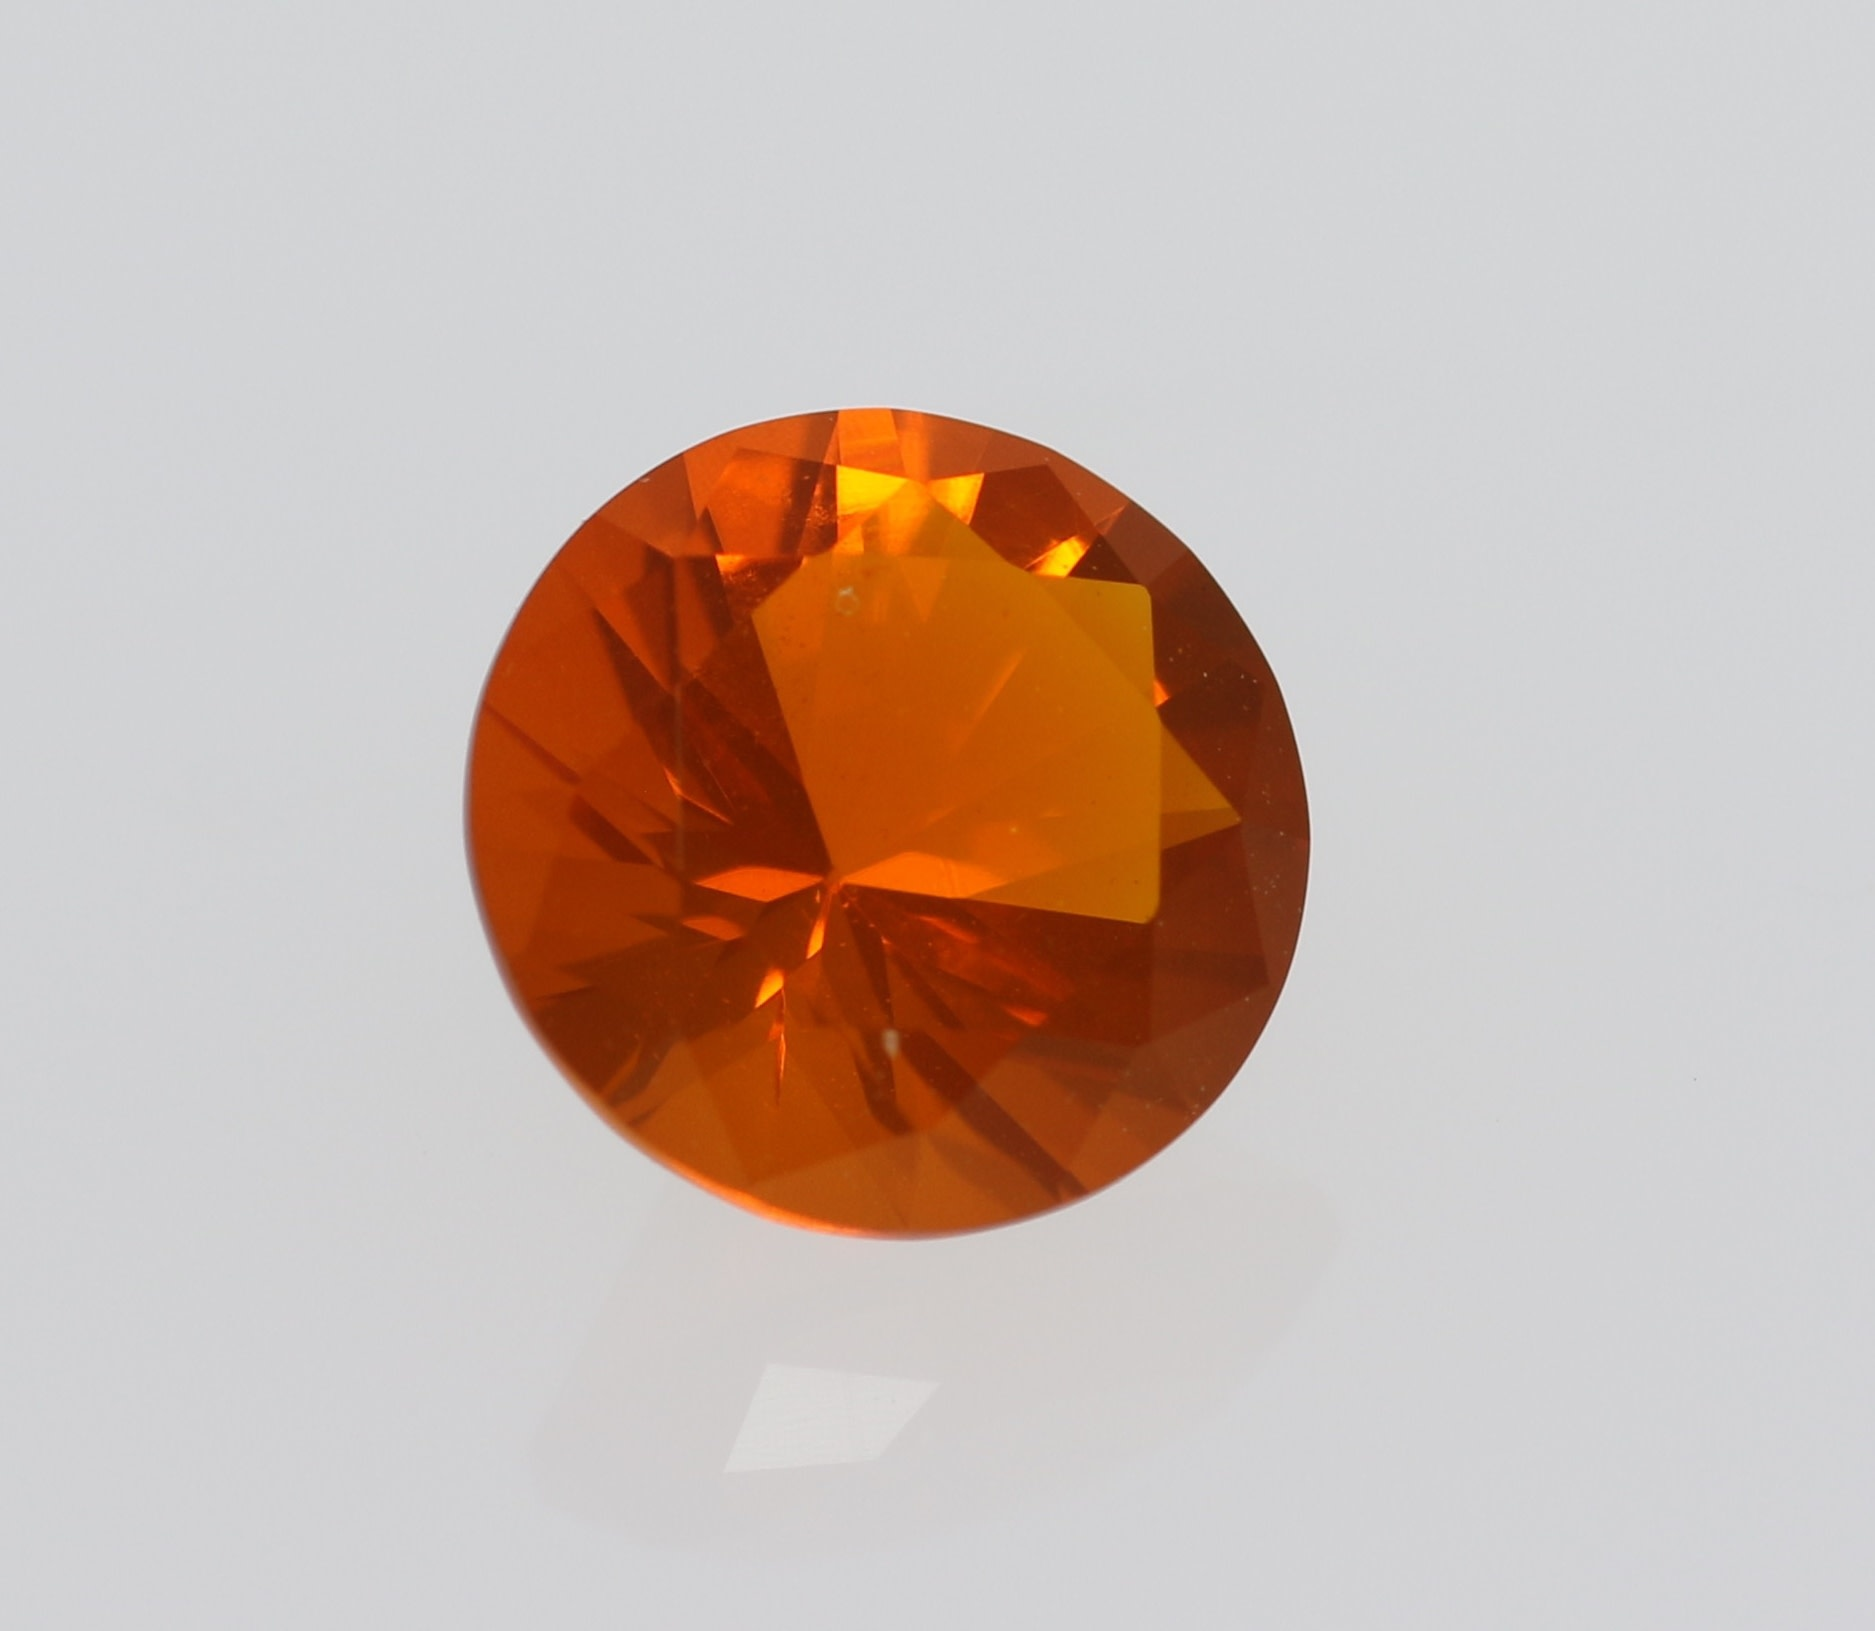 Wholesale #5118 Mexican Fire Opal Cut Stones Mexican Fire Opal Gemstone Cuts Stones Mexican Fire Faceted Round Cut Stones 4 Pcs 6 MM